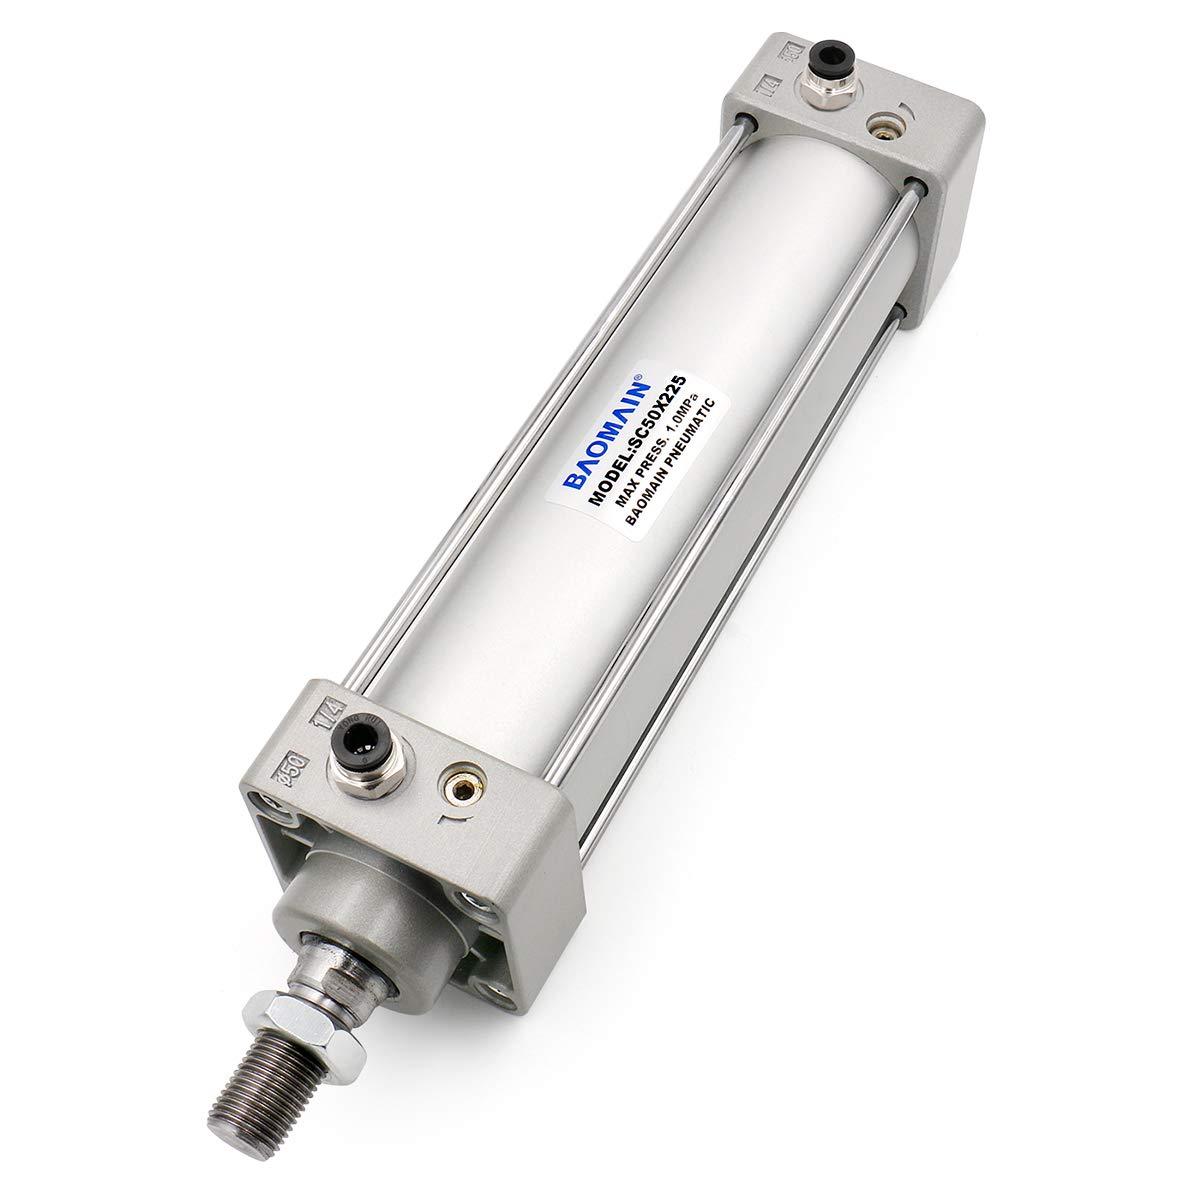 Baomain Discount mail order Pneumatic Air Cylinder SC 50 x 2